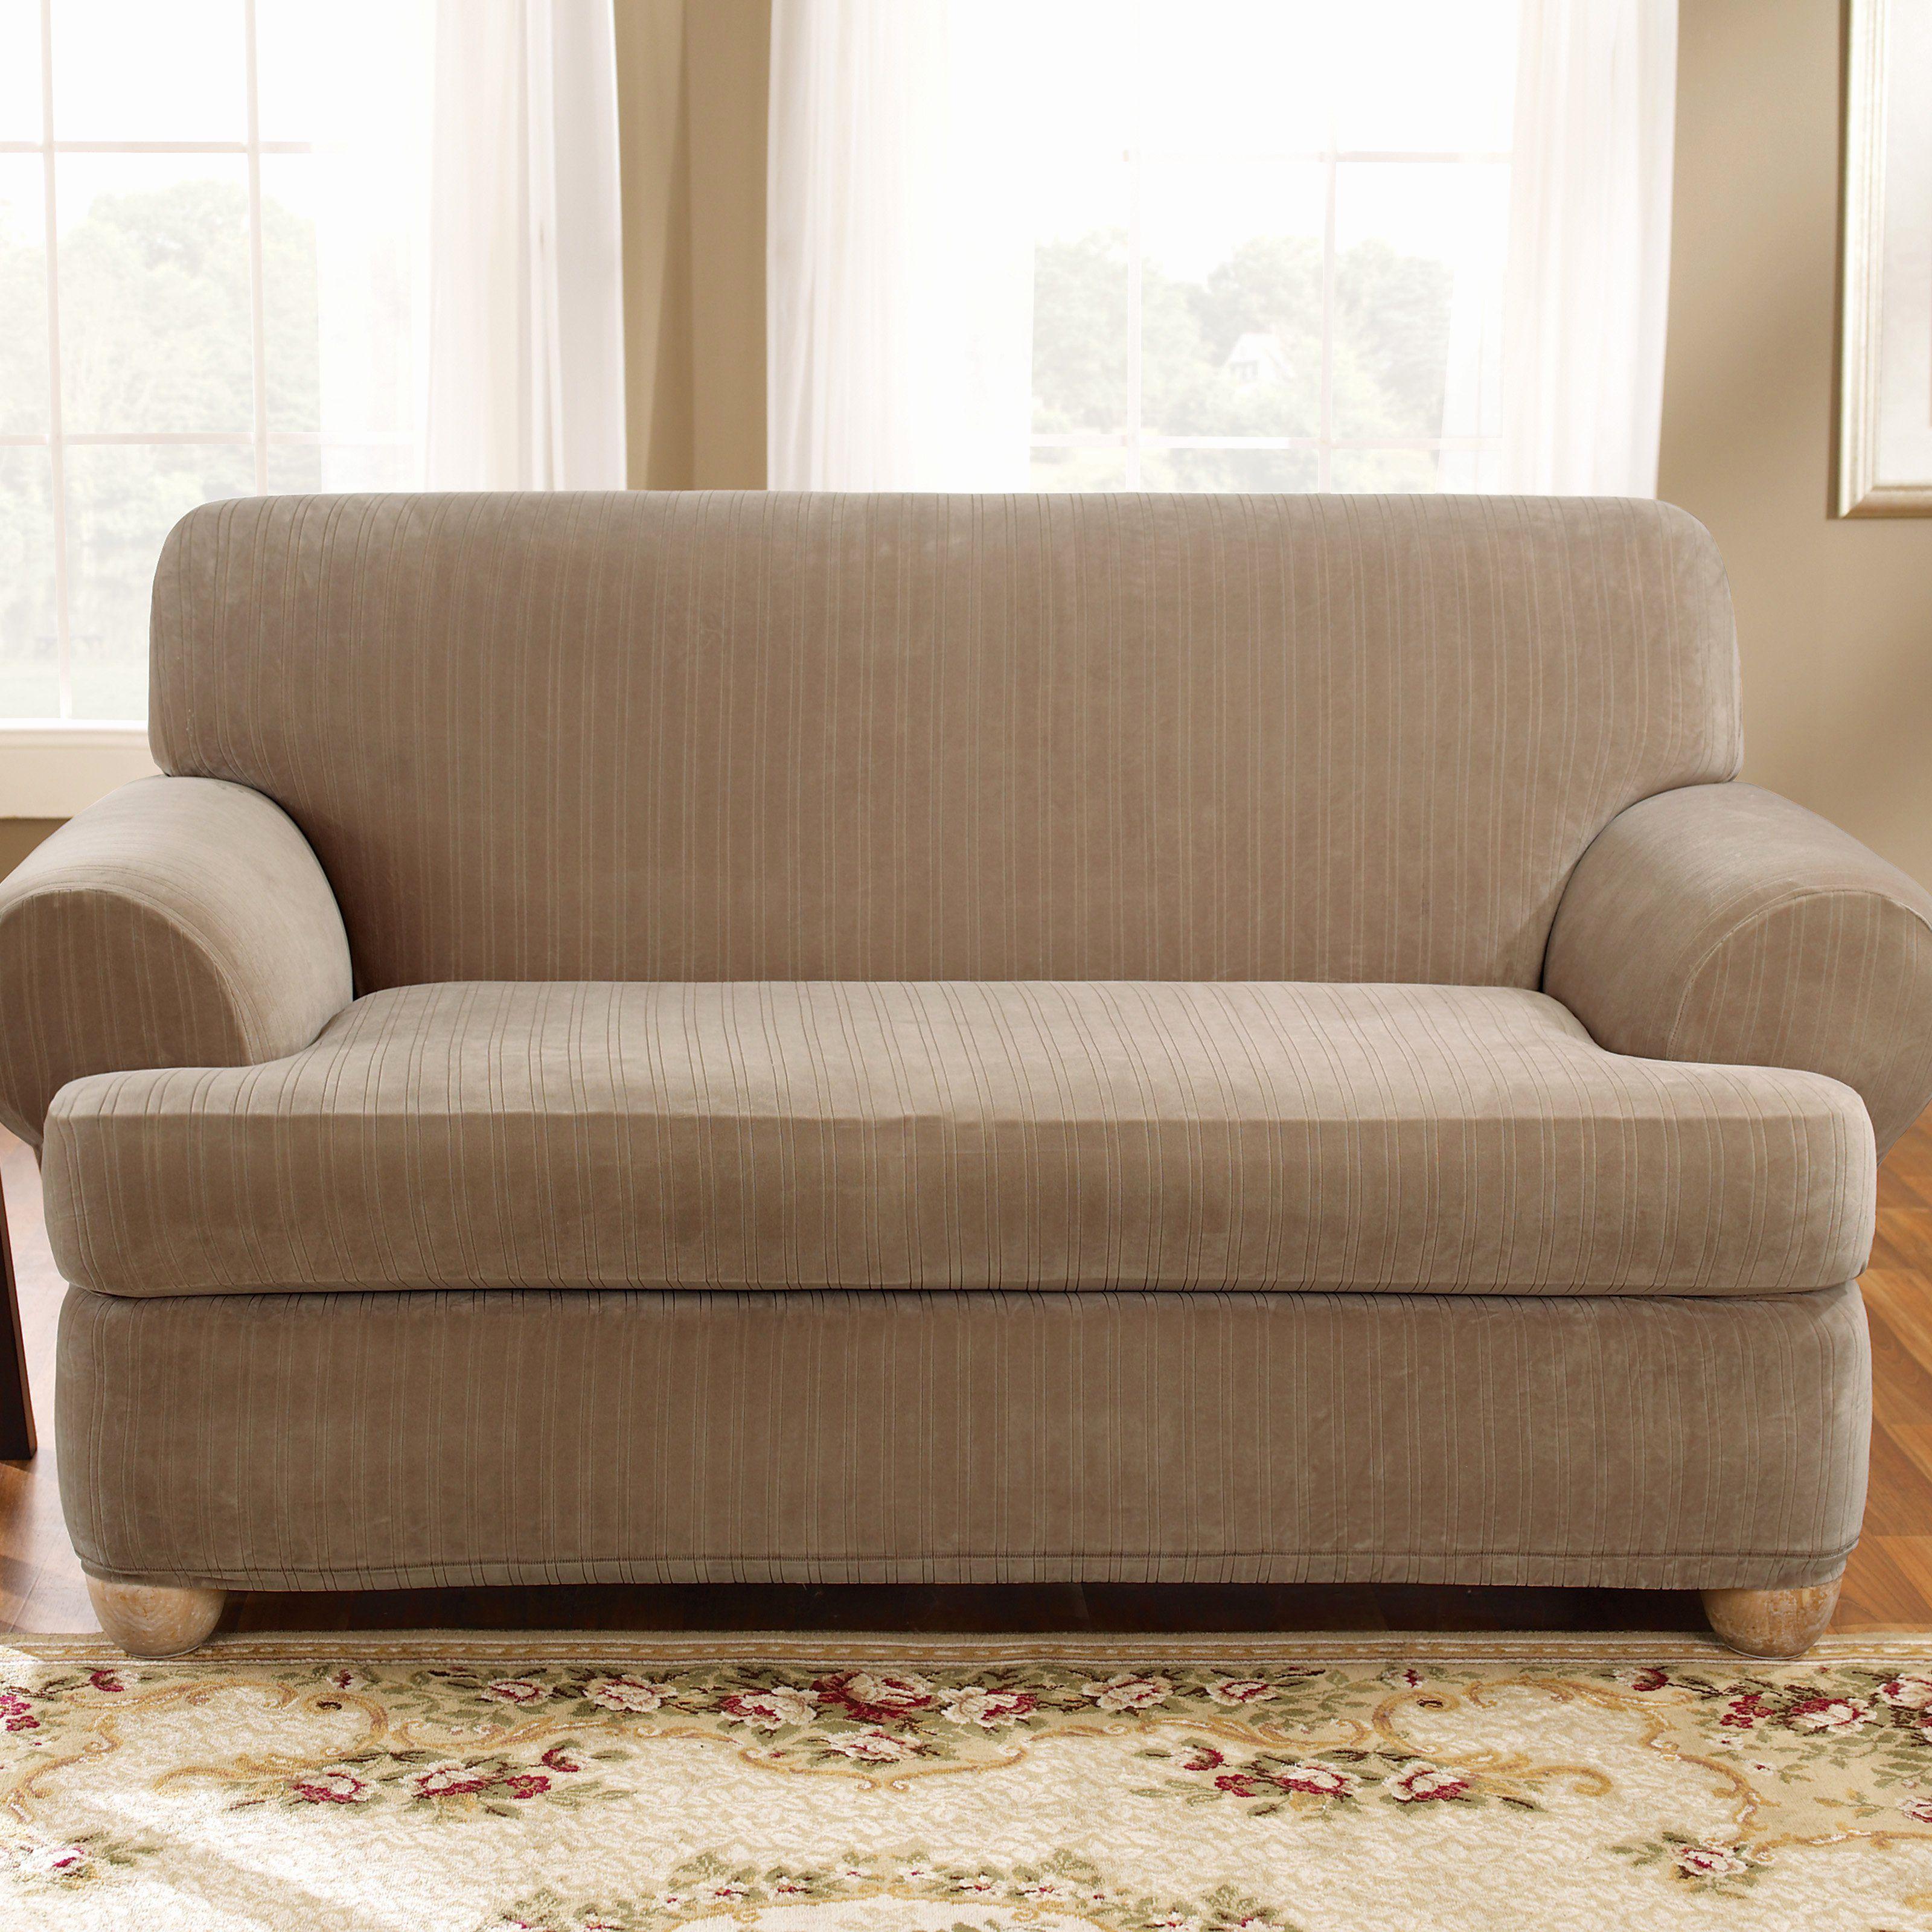 Luxury Contemporary Sofa Slipcovers Picture Contemporary Sofa